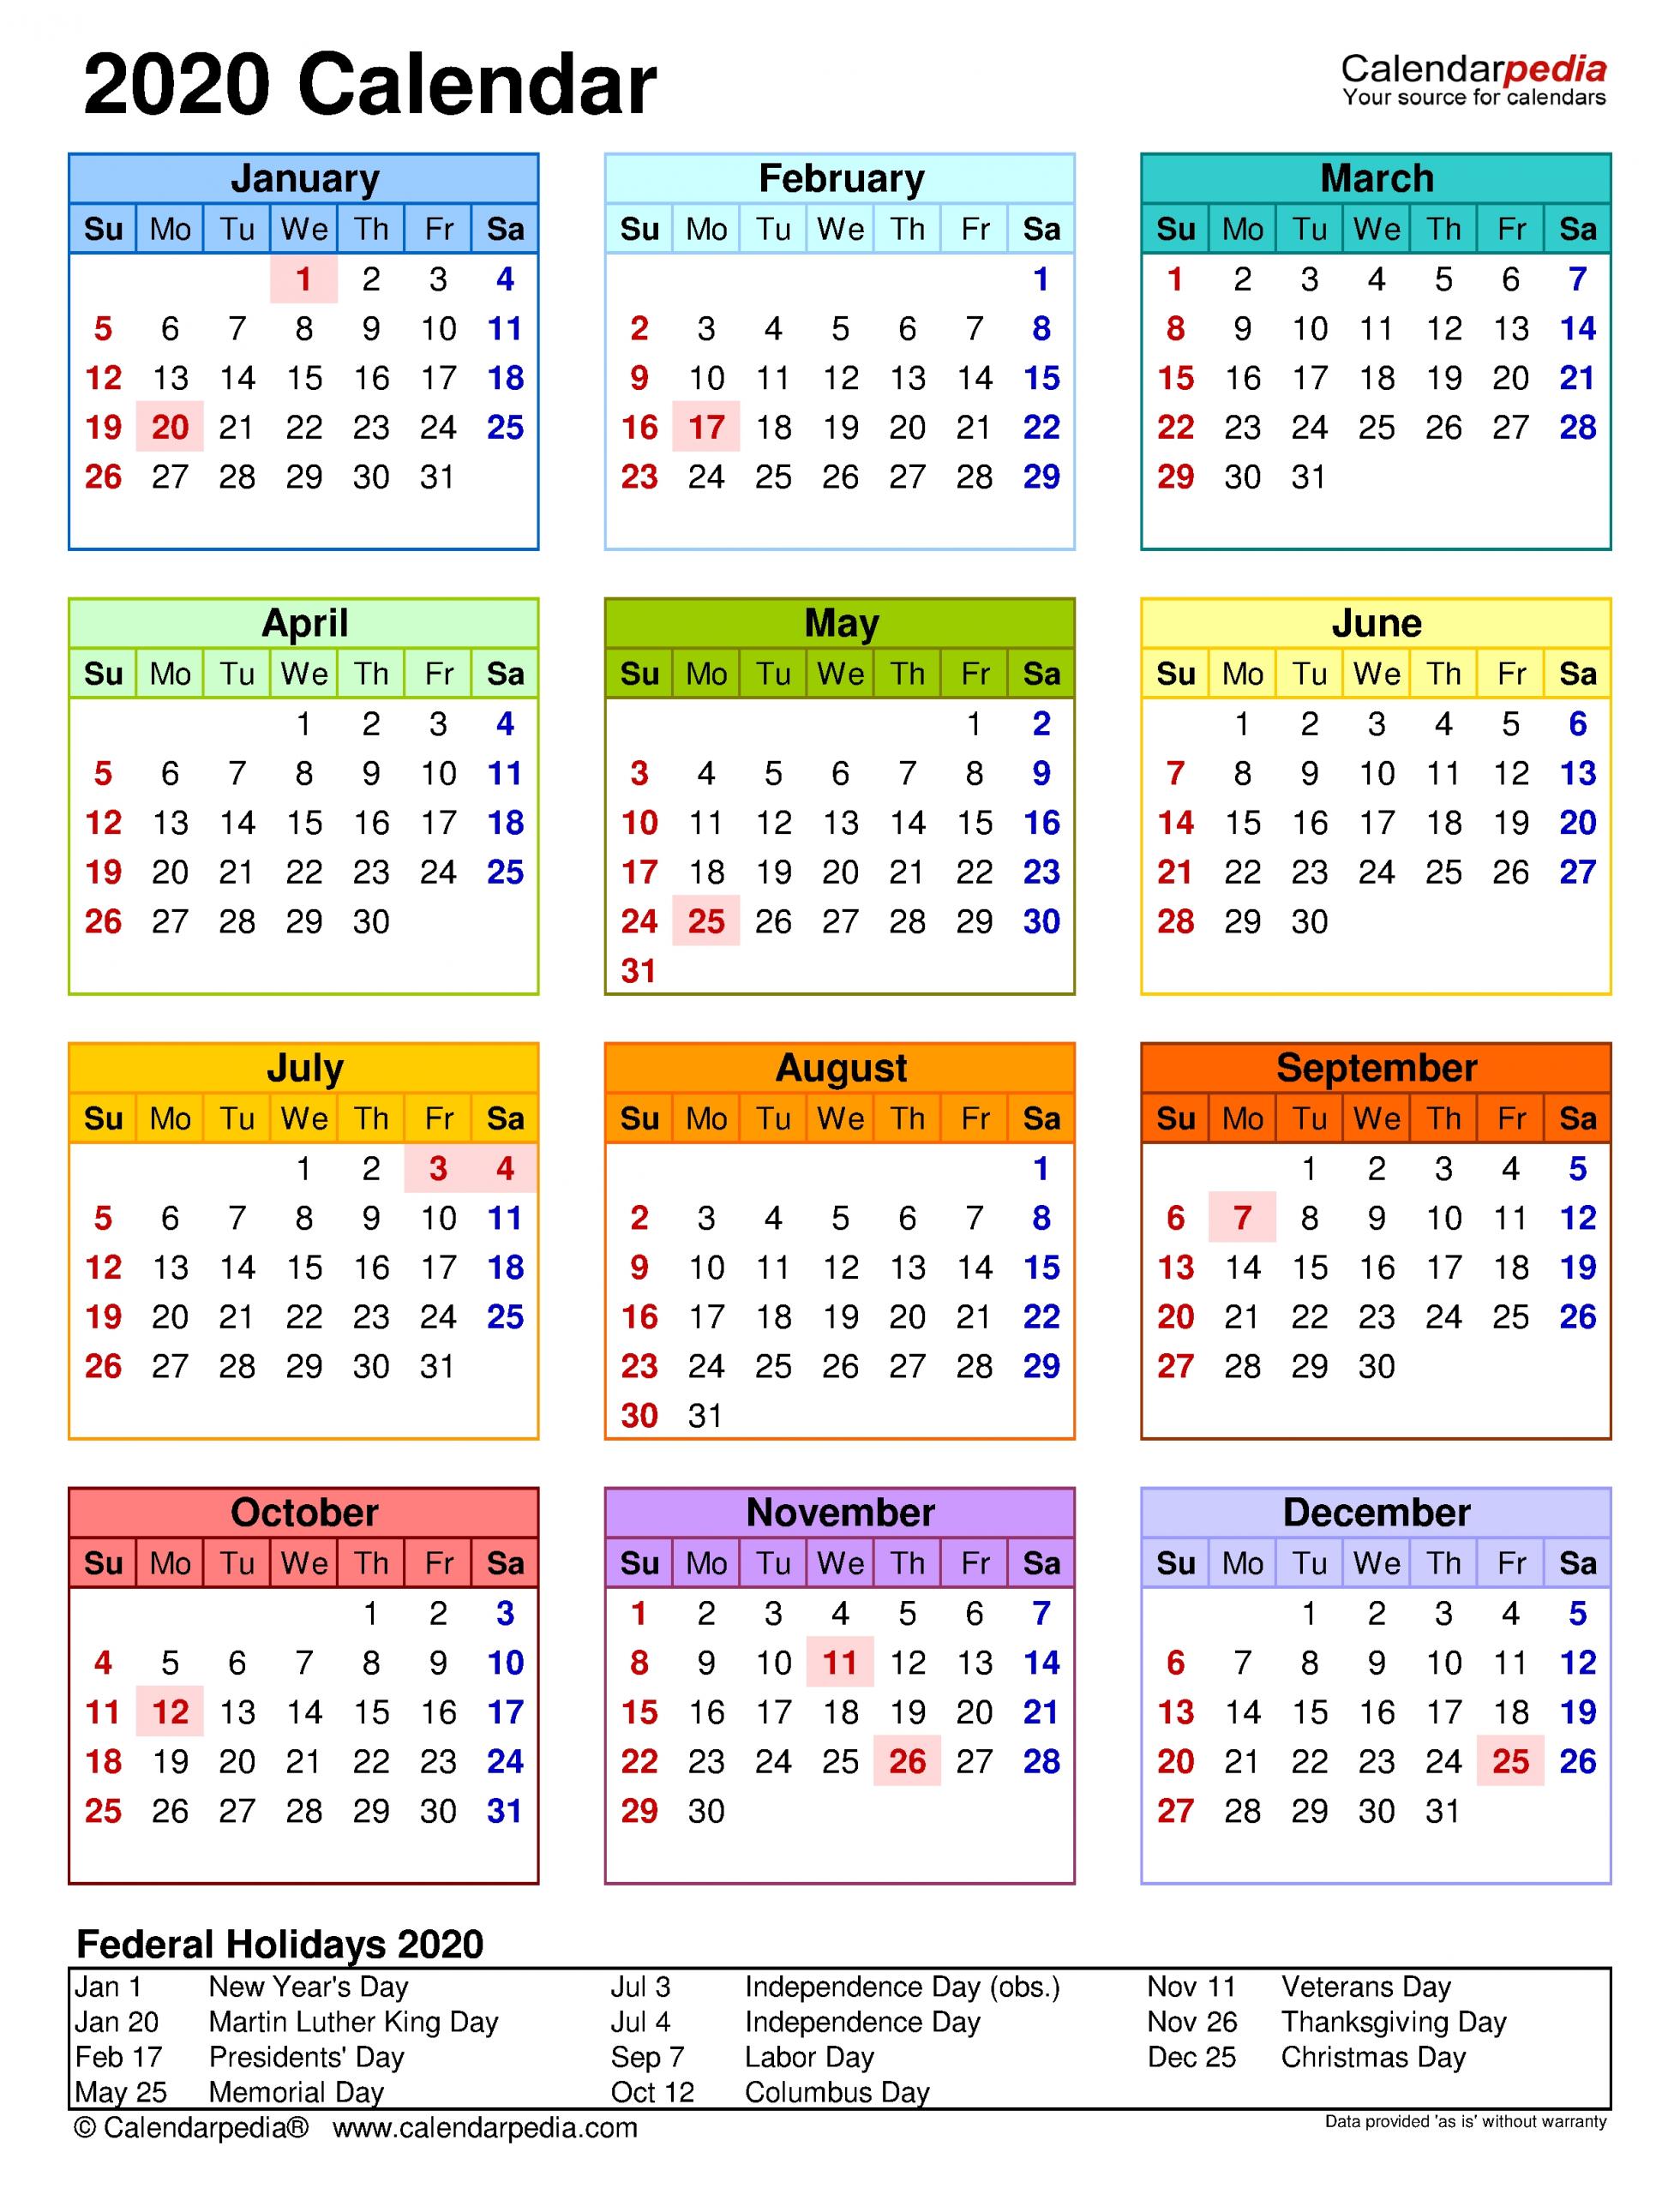 2020 Calendar - Free Printable Word Templates - Calendarpedia throughout 2020 Calendar Landscape Year At A Glance